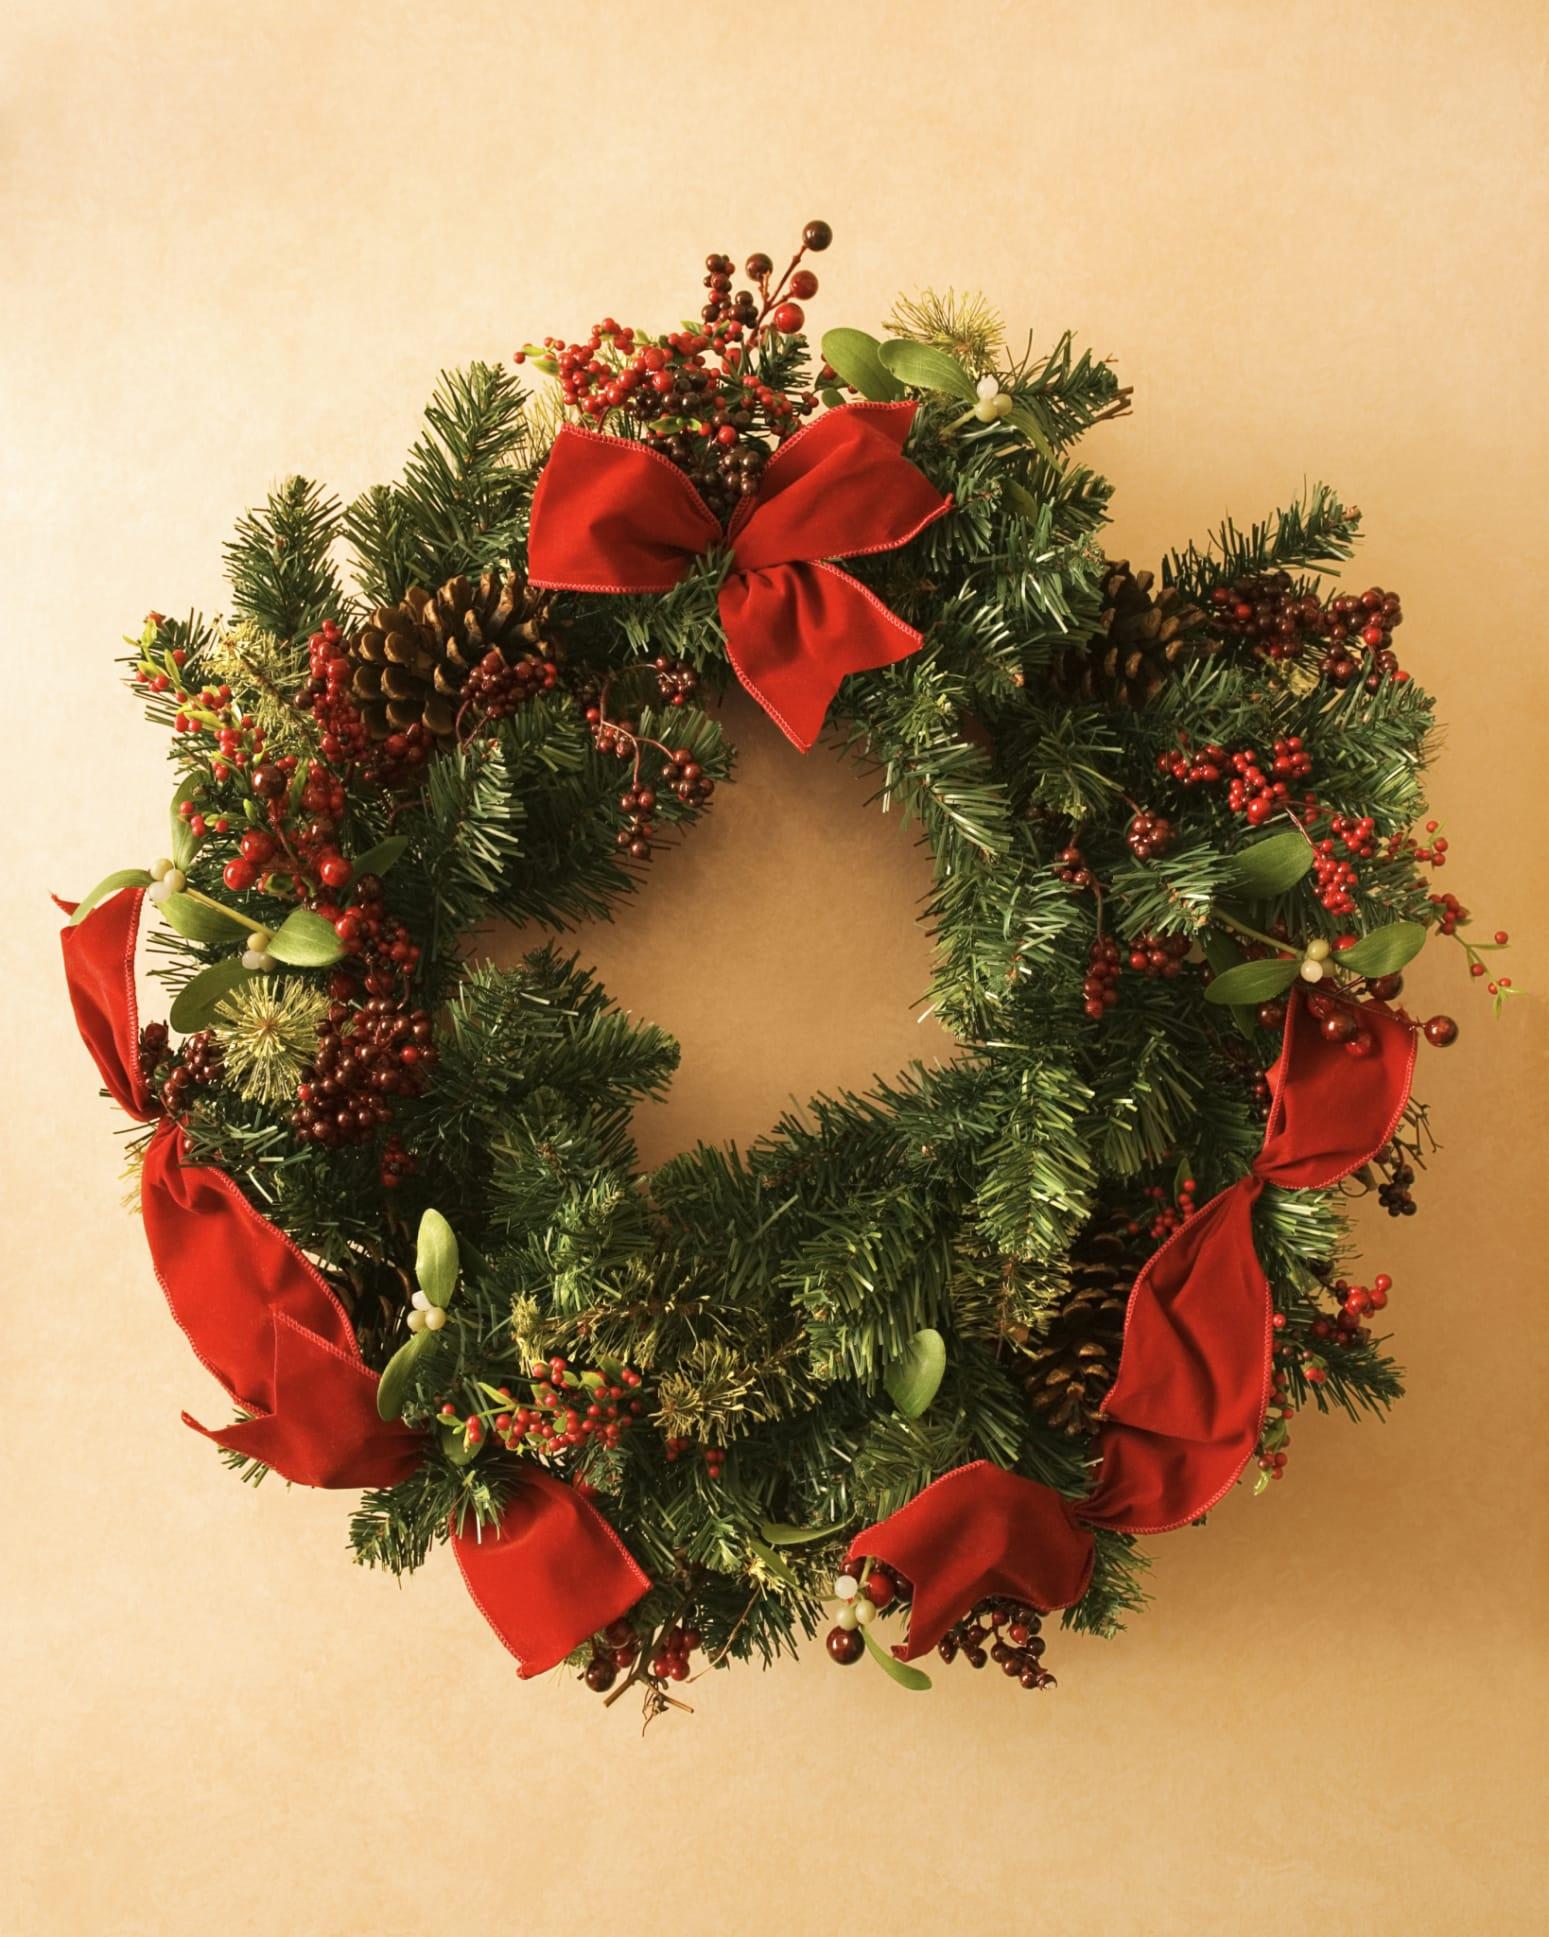 Decorazioni natalizie fai da te la ghirlanda foto non - Decorazioni natalizie legno fai da te ...